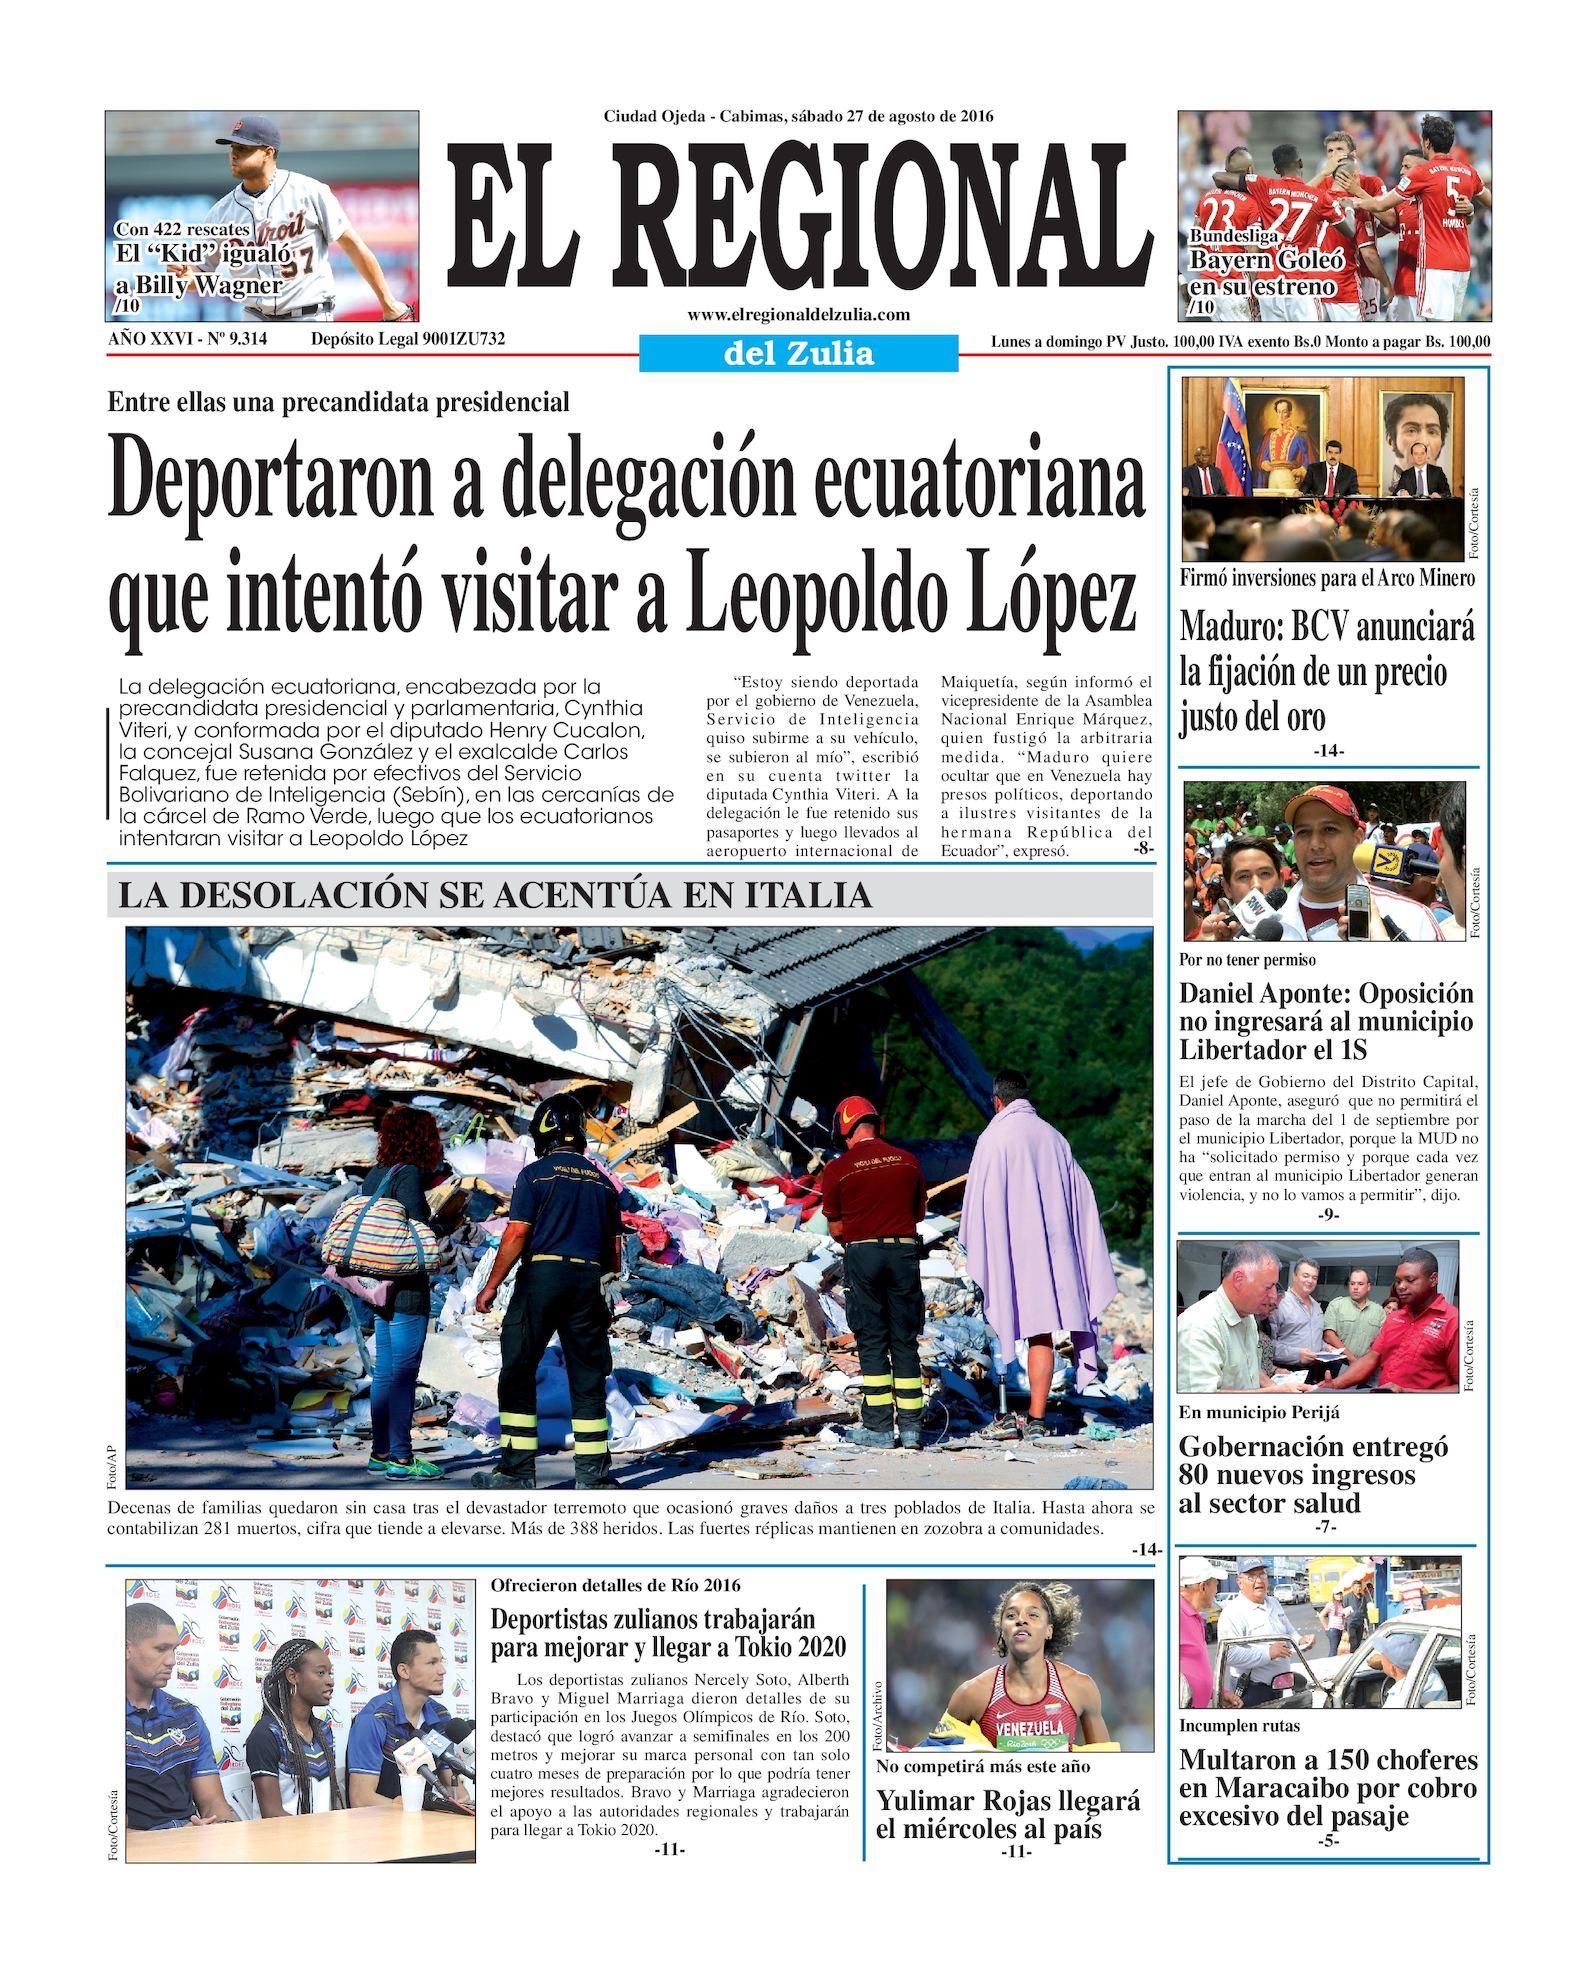 Calaméo - El Regional del Zulia 27-08-2016